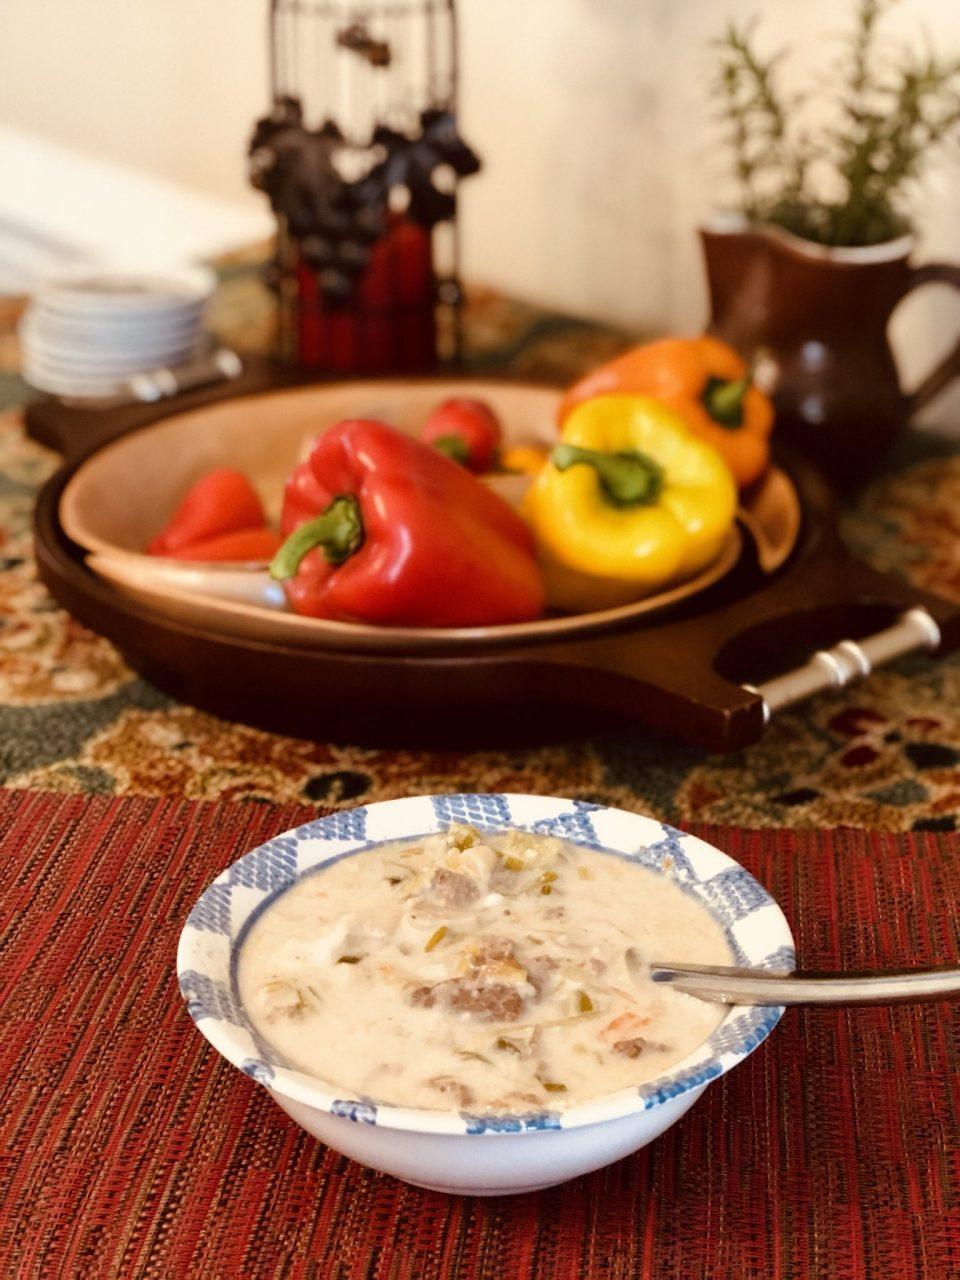 Creamy garlic leek soup